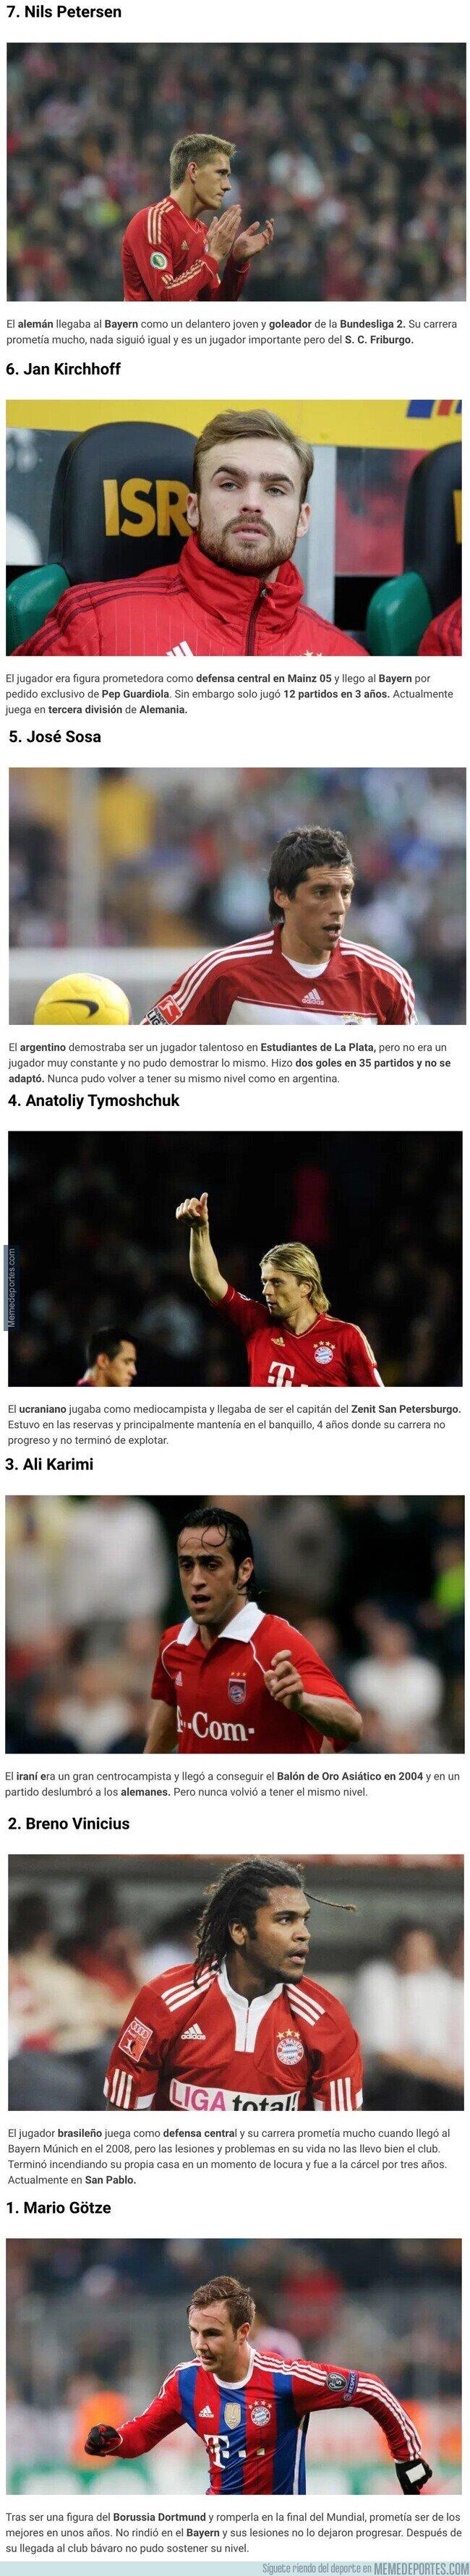 1103912 - 7 jugadores a los que se les arruinó la carrera cuando llegaron al Bayern Múnich